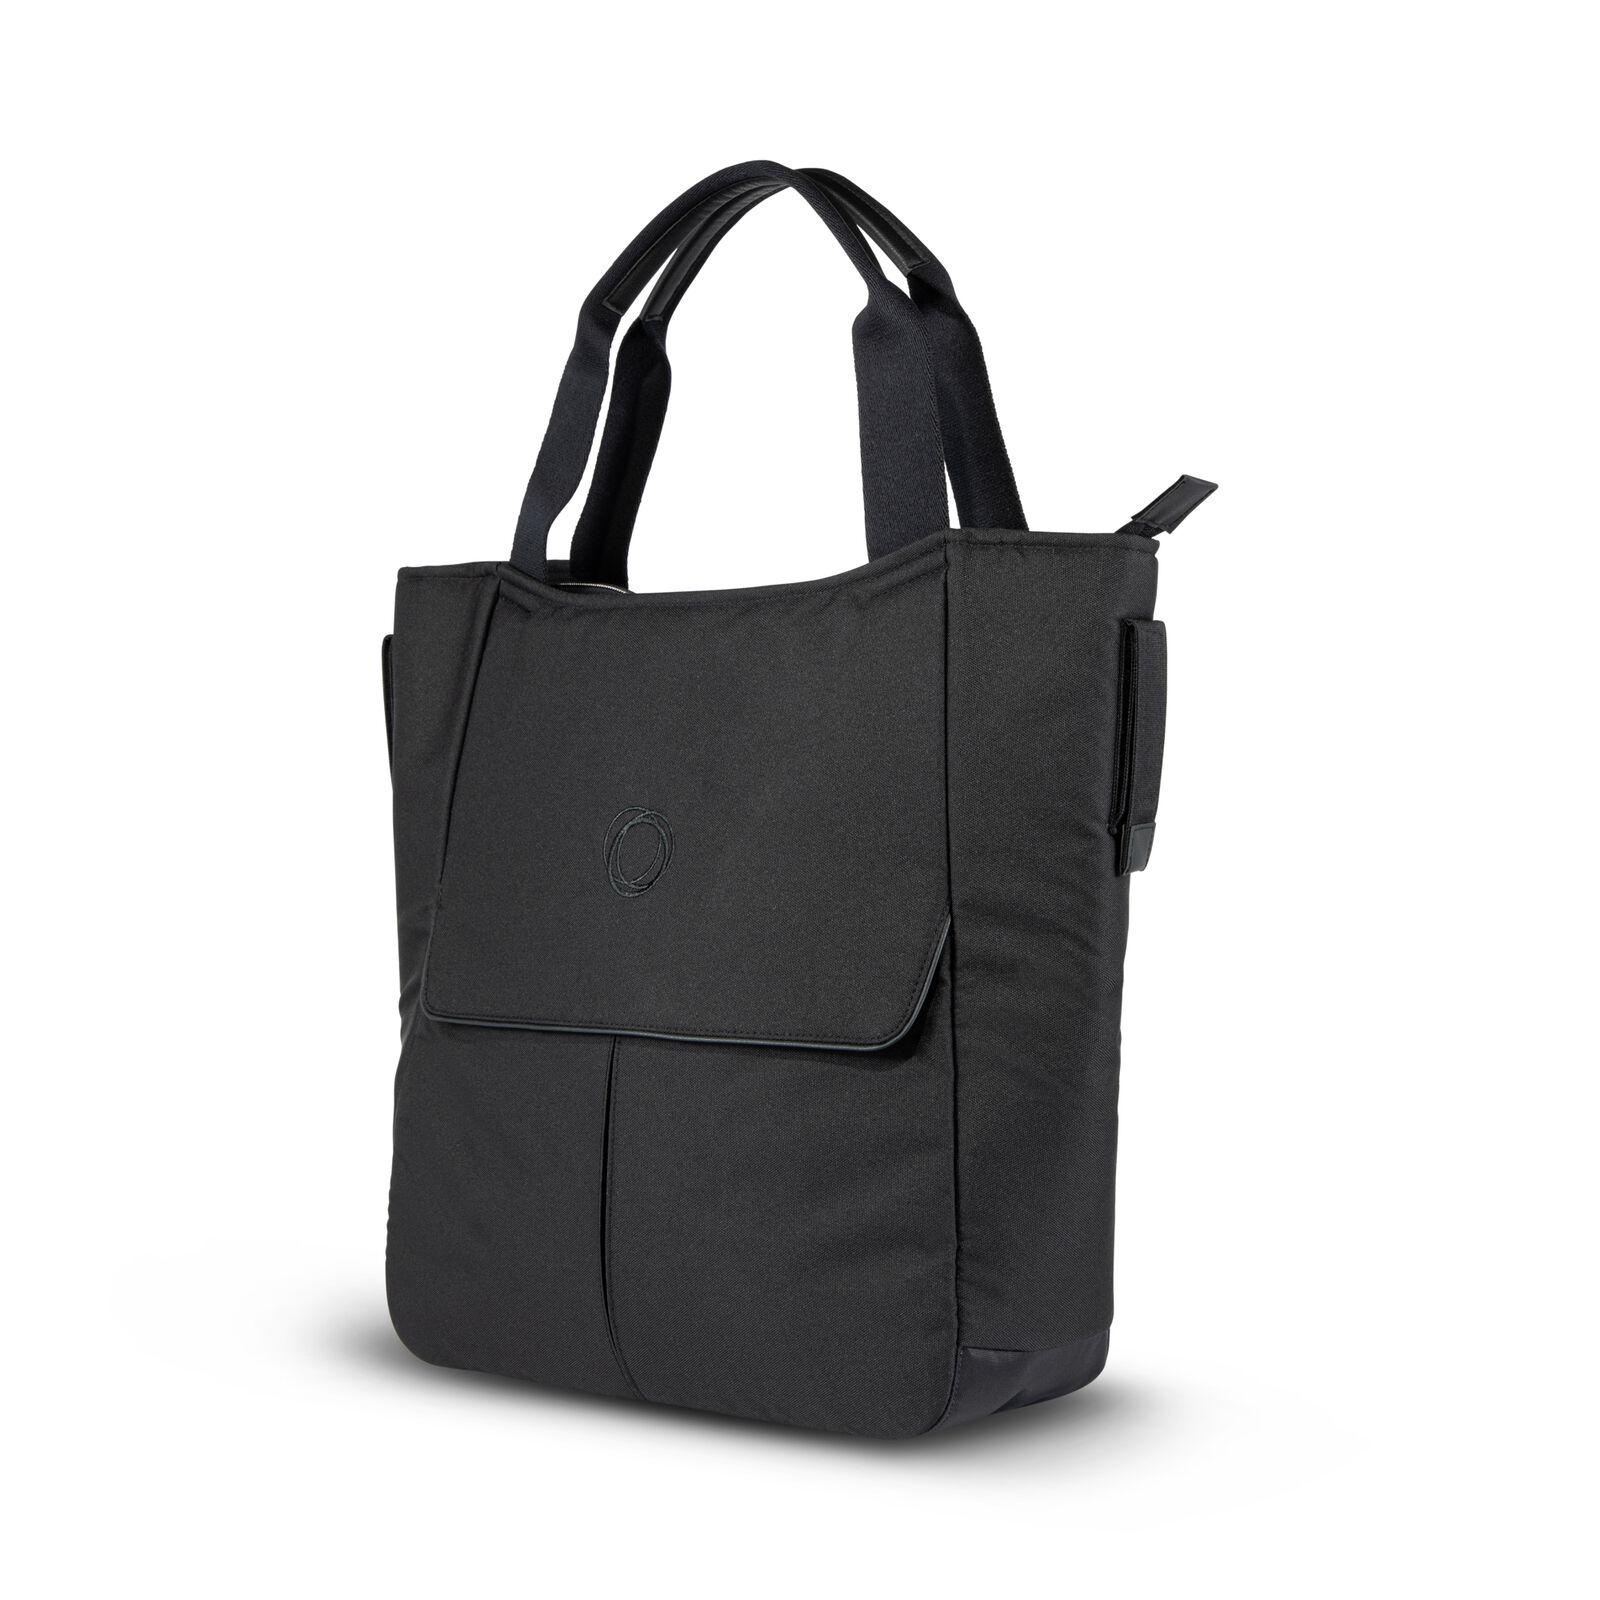 Bugaboo XL Tasche